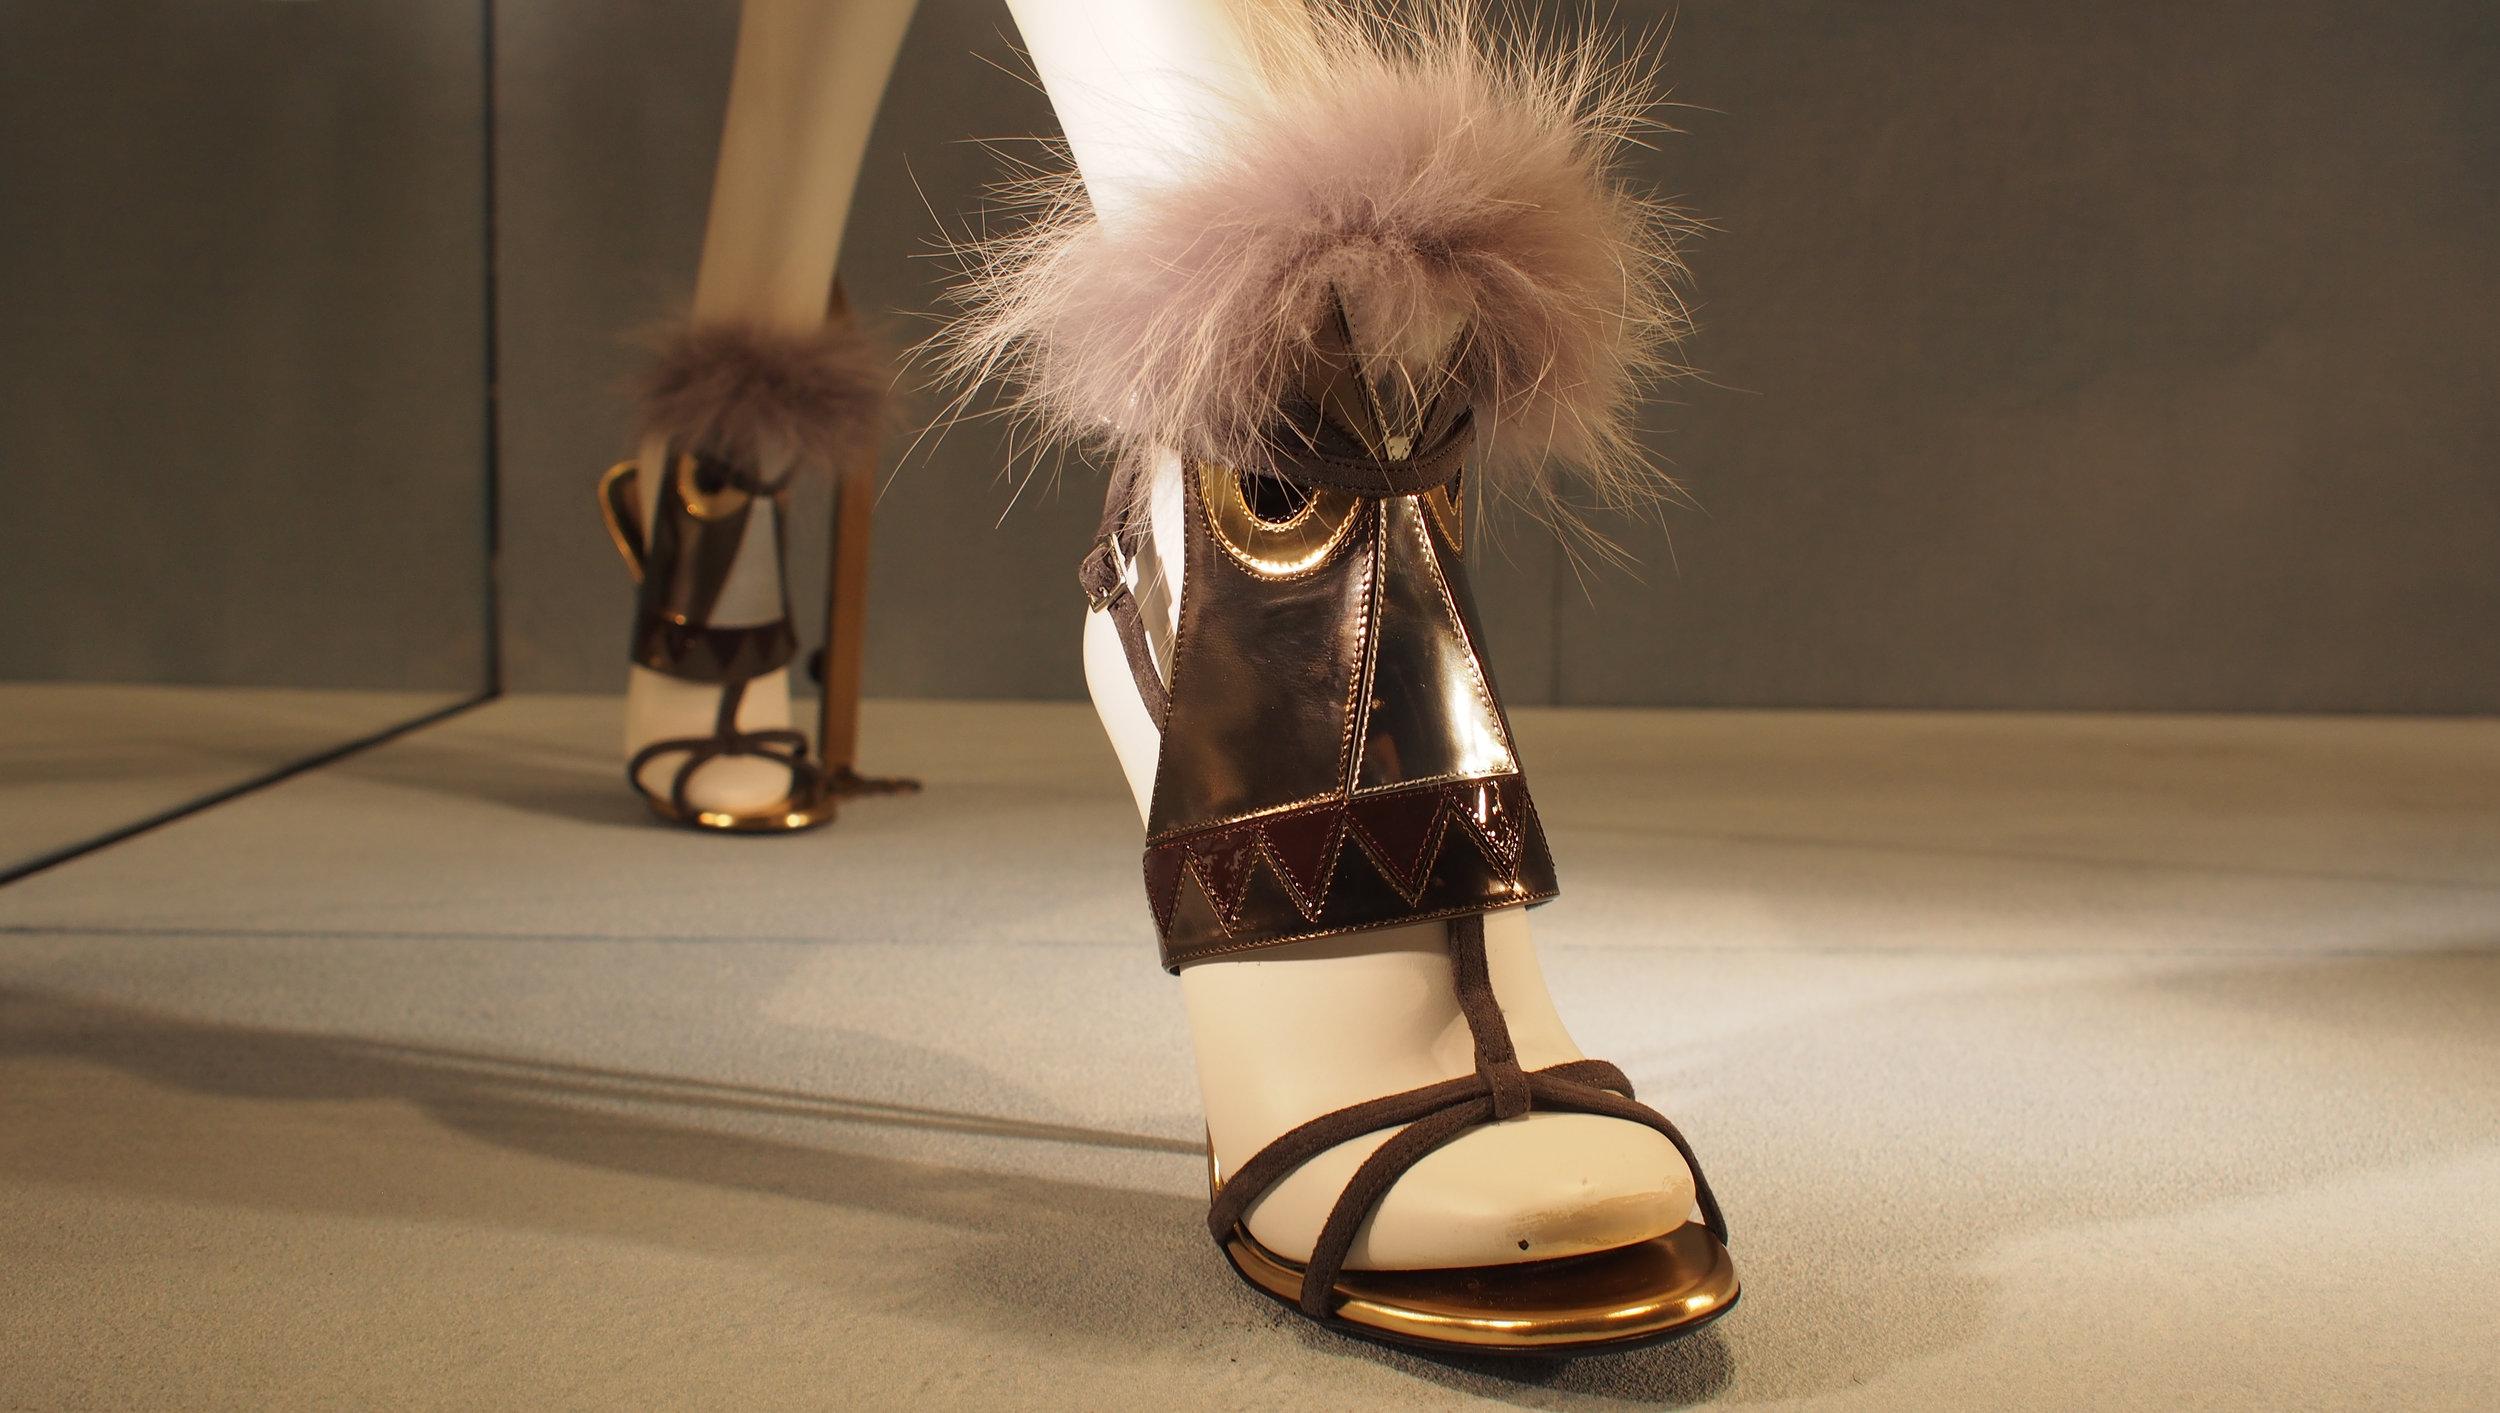 Persoonalliset sandaalit Fendi 1150 €